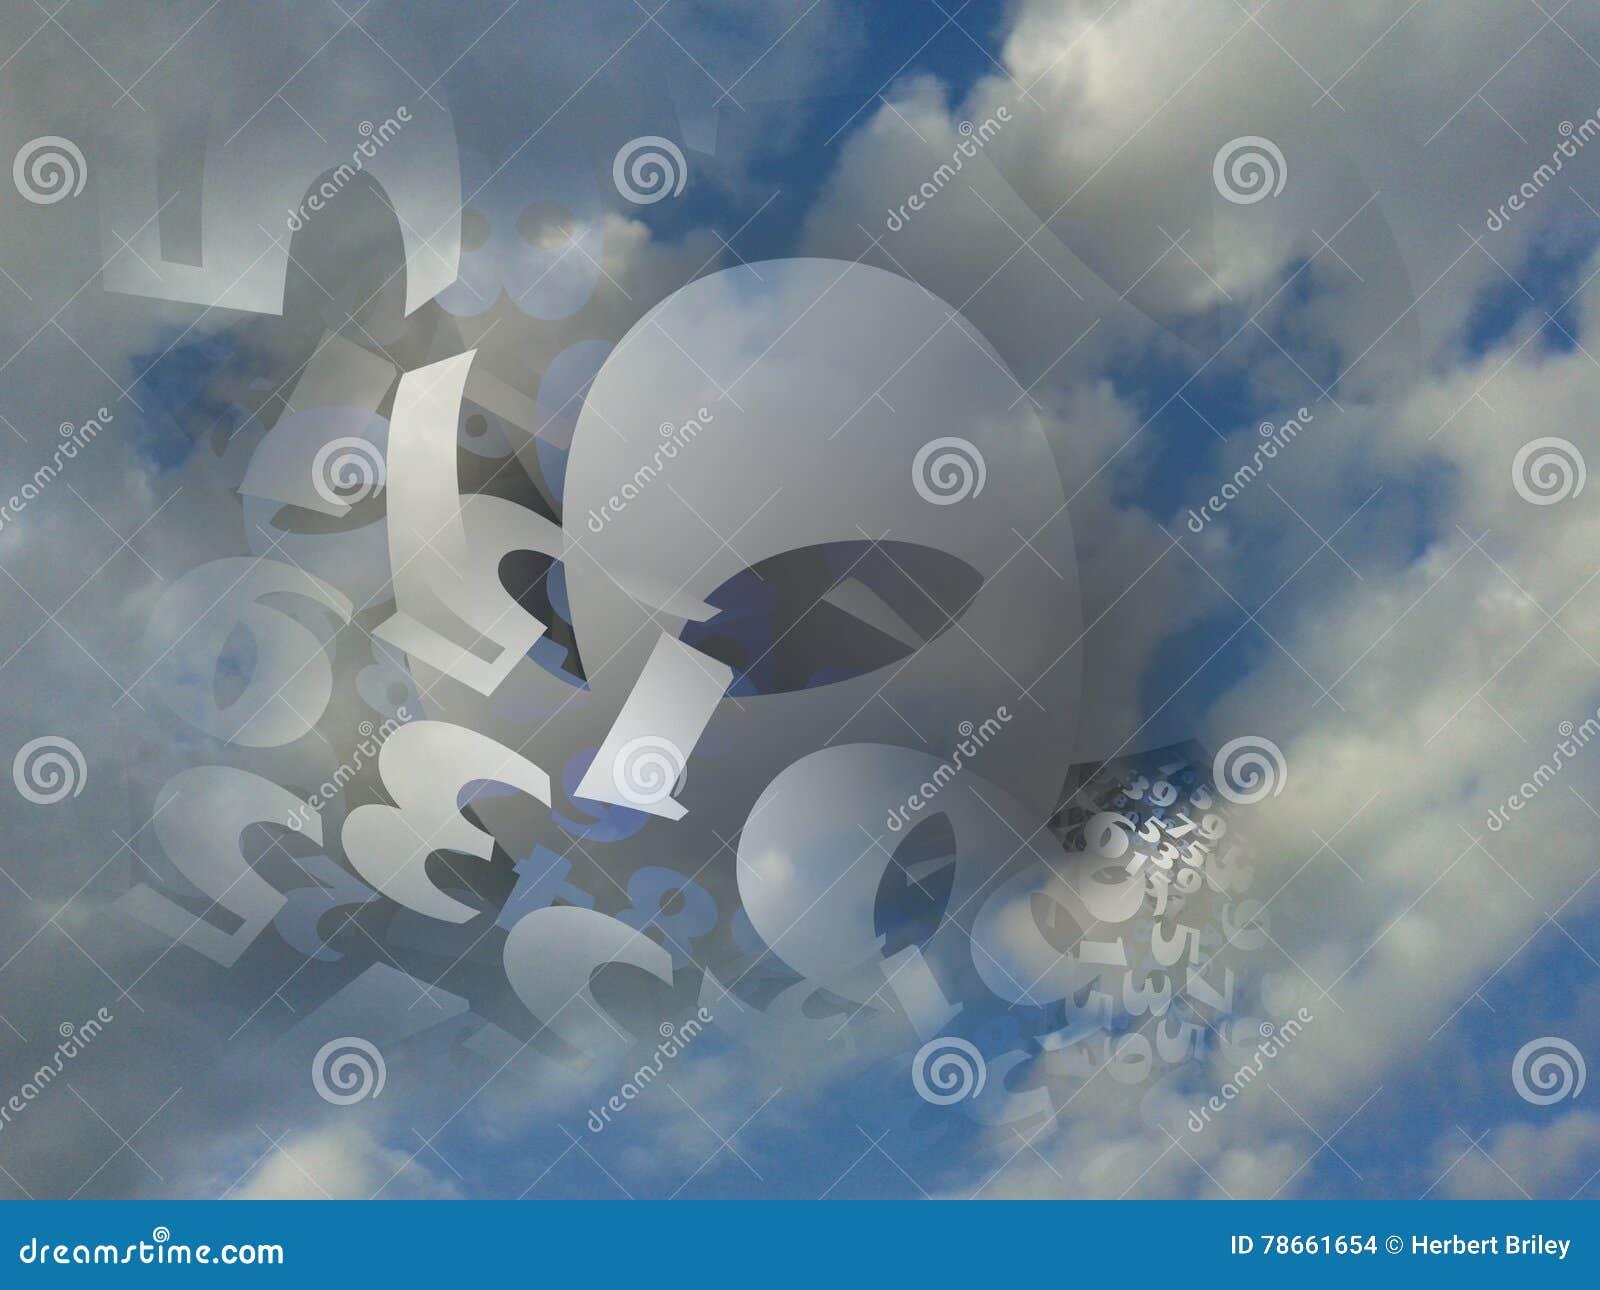 Random numbers generated cloud background illustration